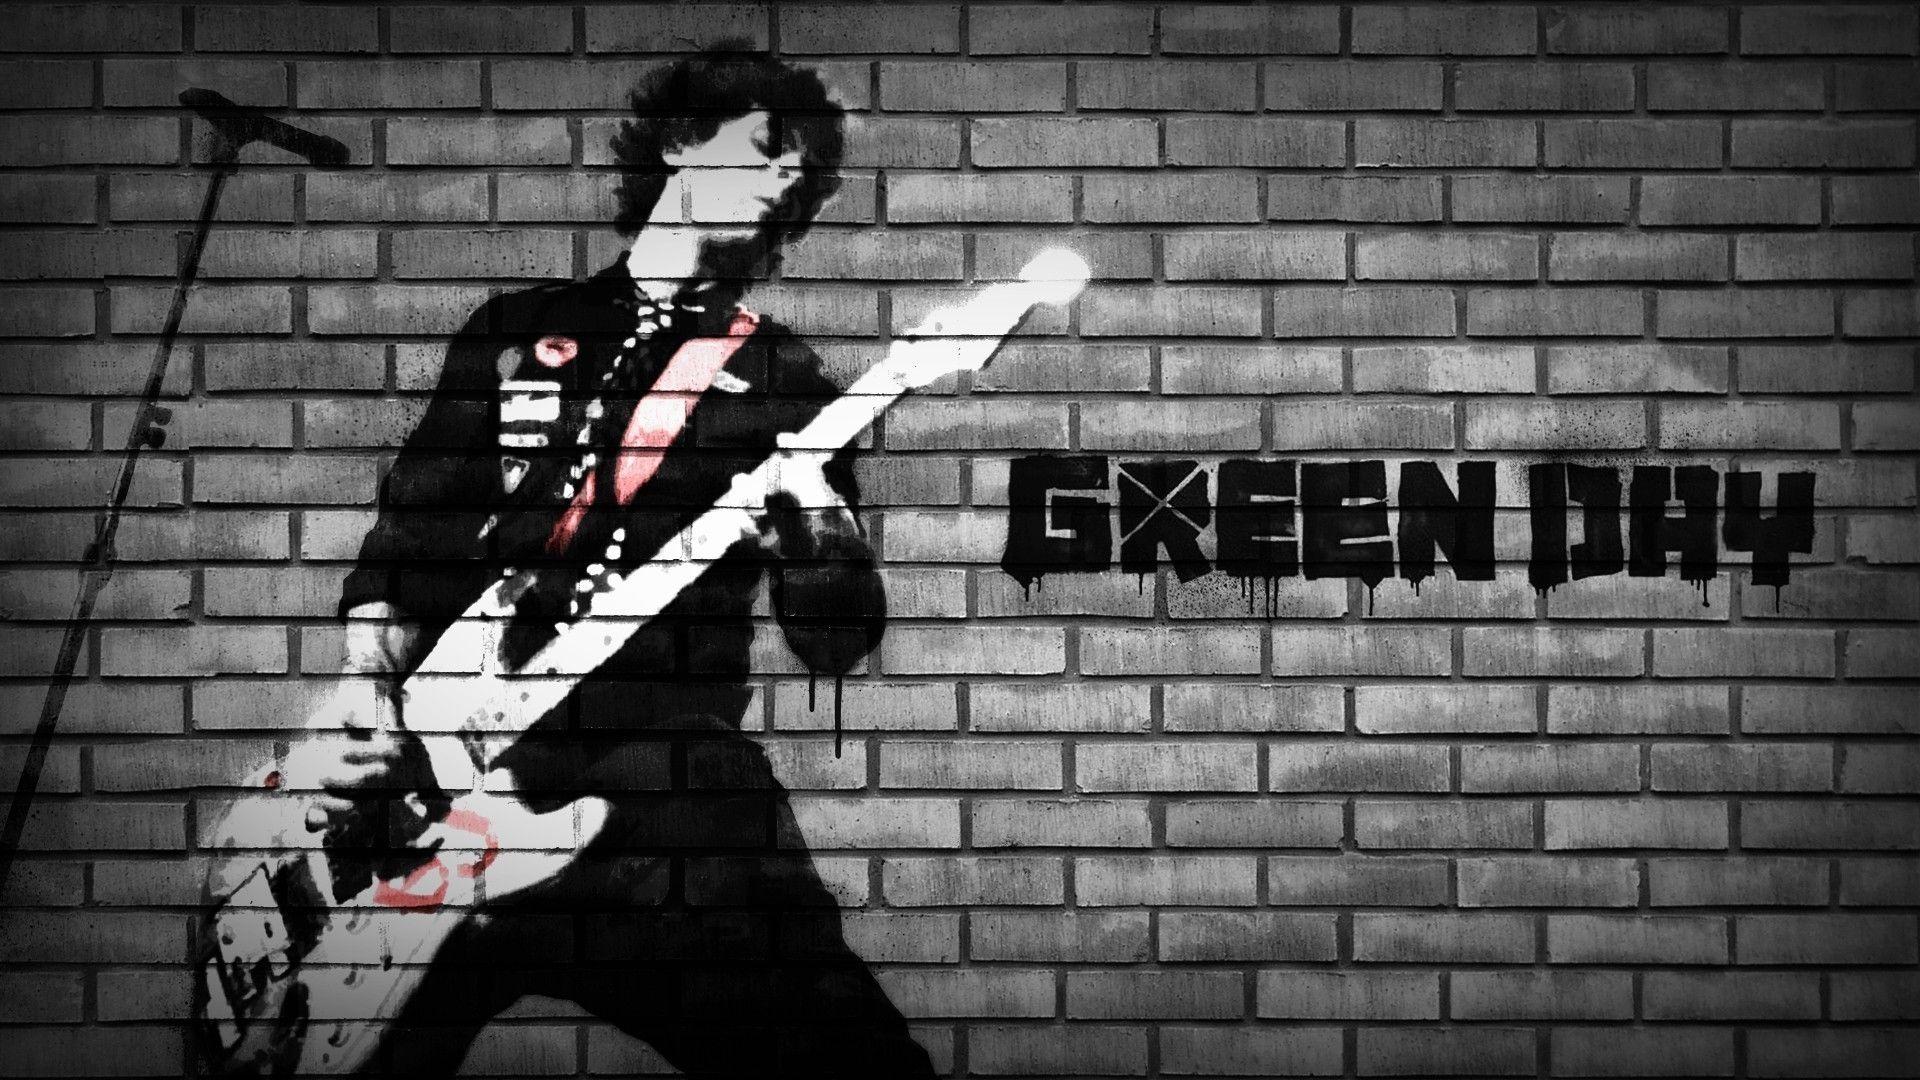 Great Wallpaper Logo Green Day - green-day,-graffiti-195871  Graphic_902498.jpg?no-logo